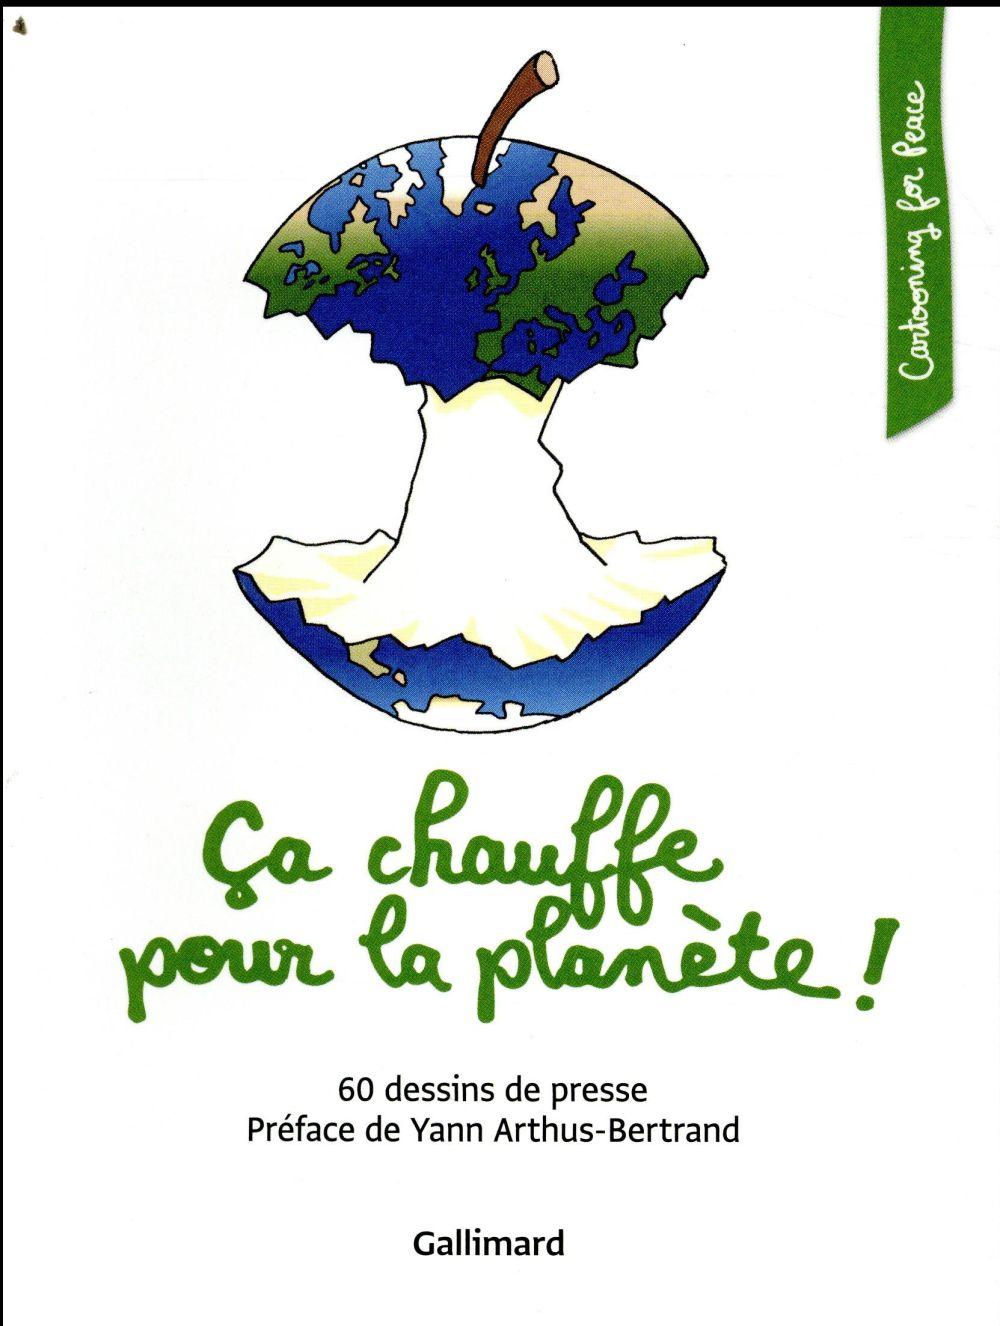 CA CHAUFFE POUR LA PLANETE ! - 60 DESSINS DE PRESSE COLLECTIF